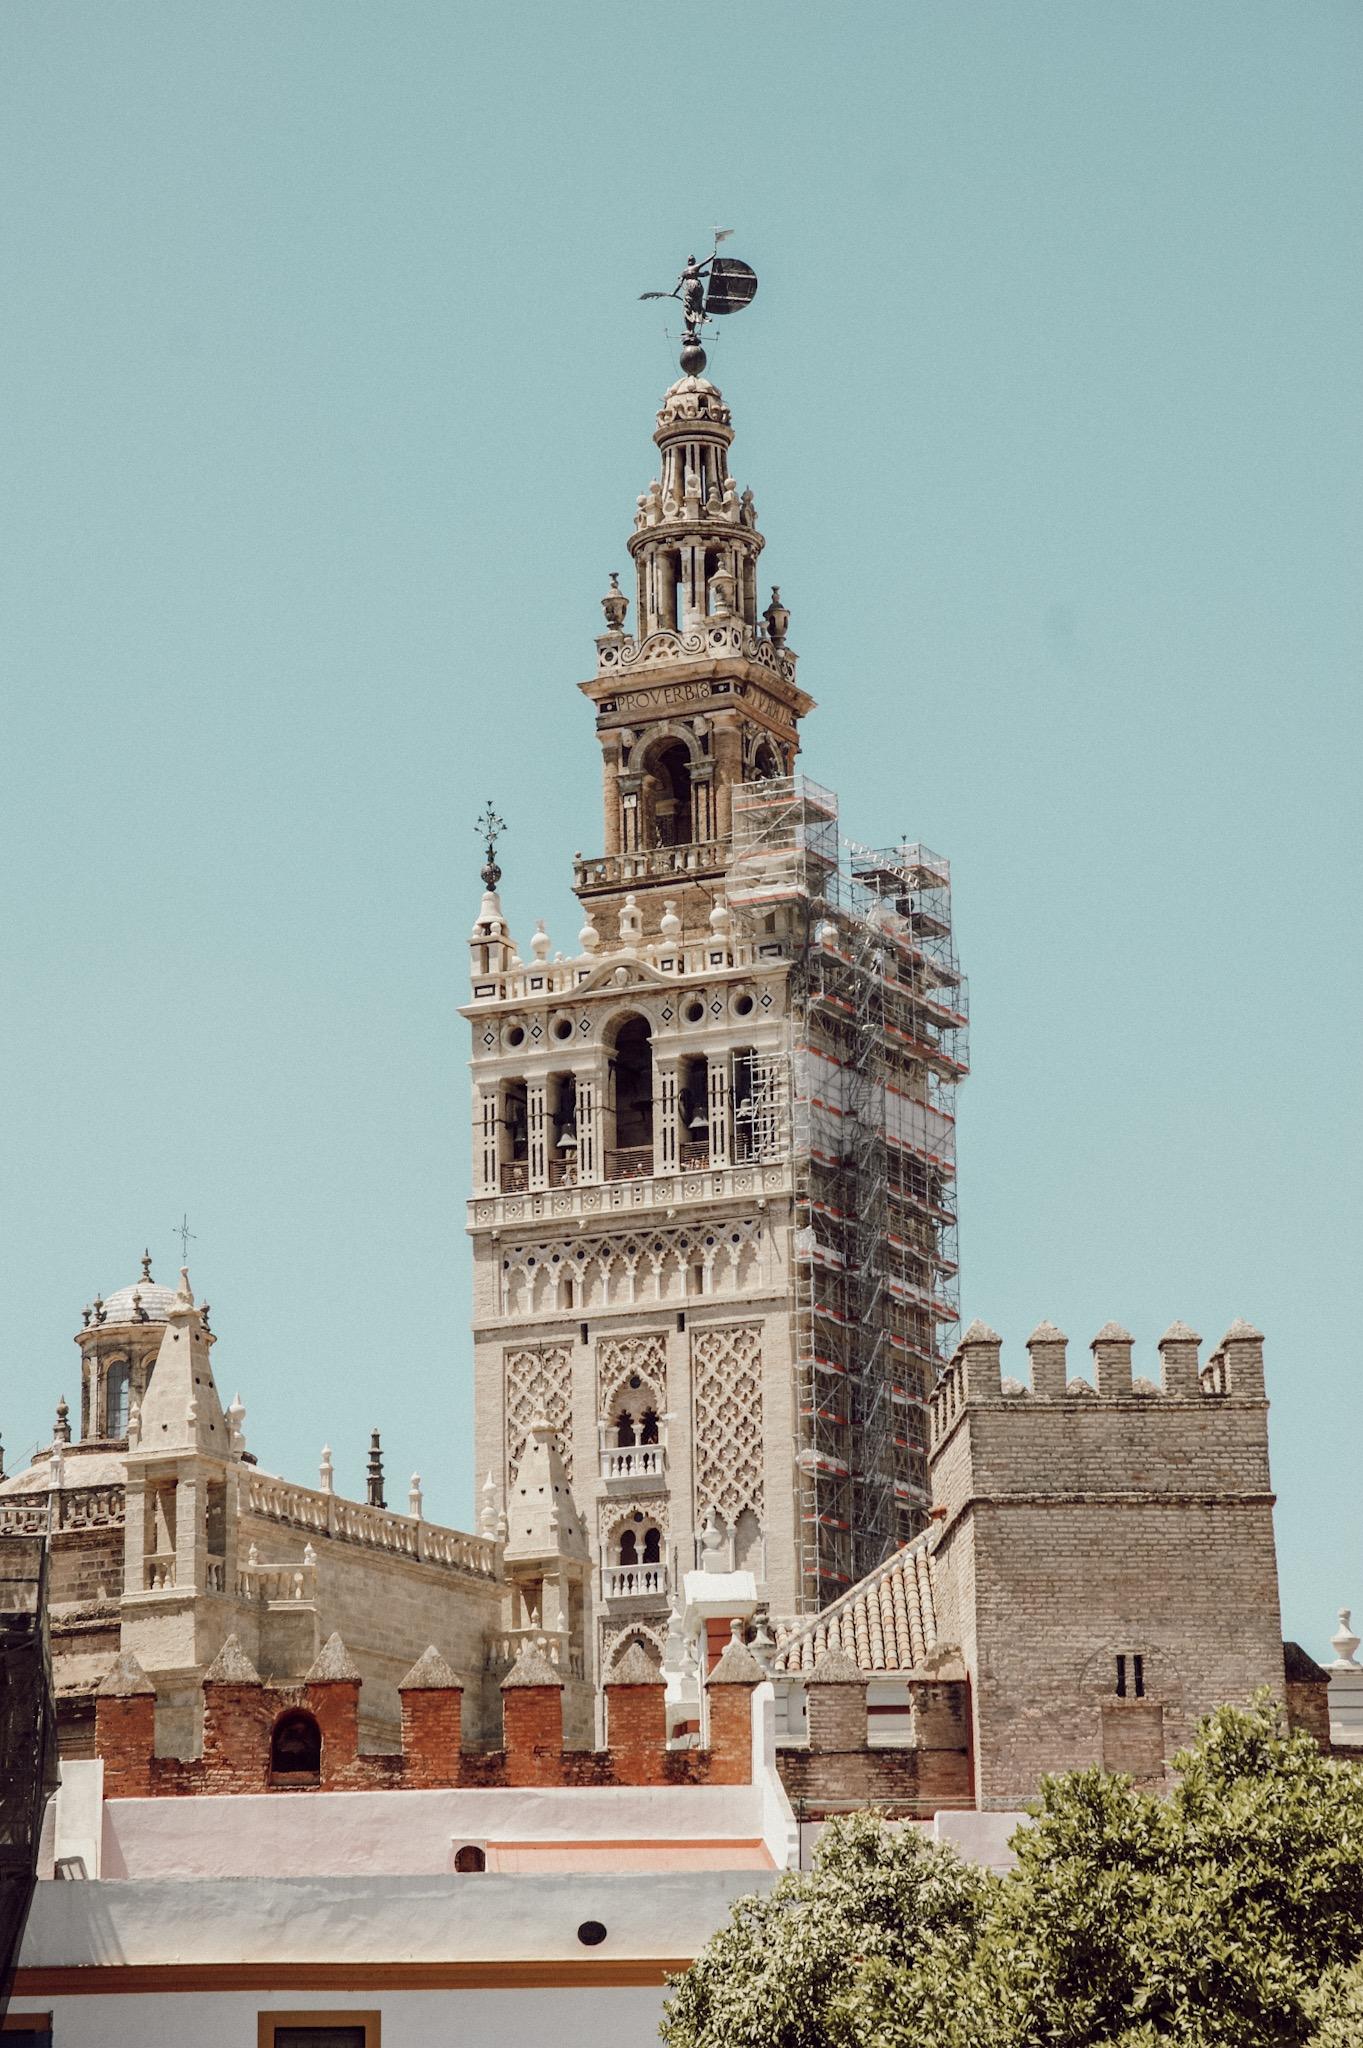 Sevilla La Giralda Glockenturm